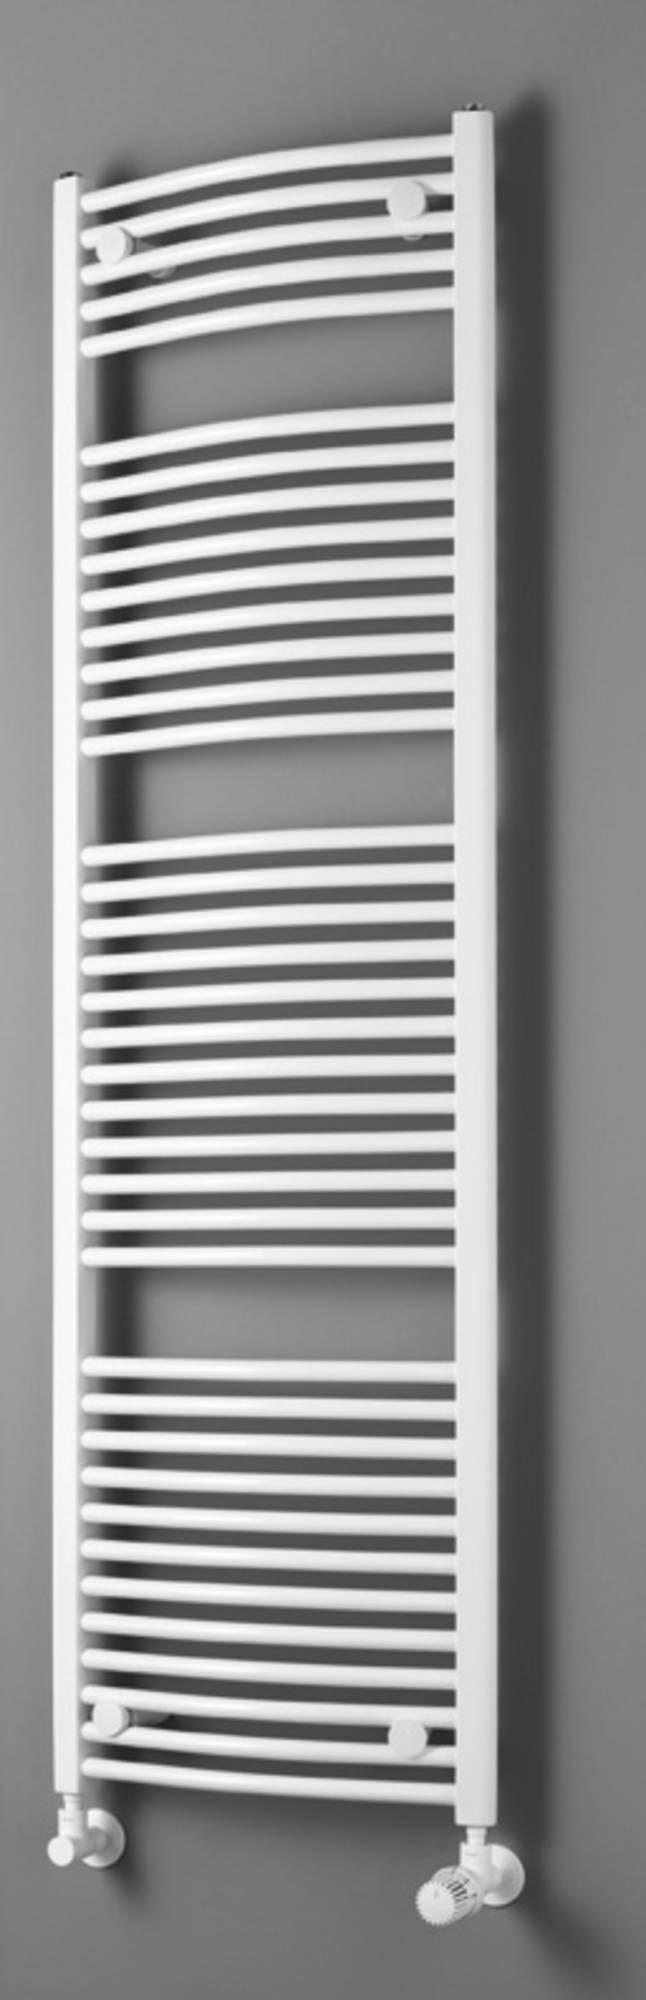 Ben Samos Designradiator 50x177,5cm 1043watt Wit